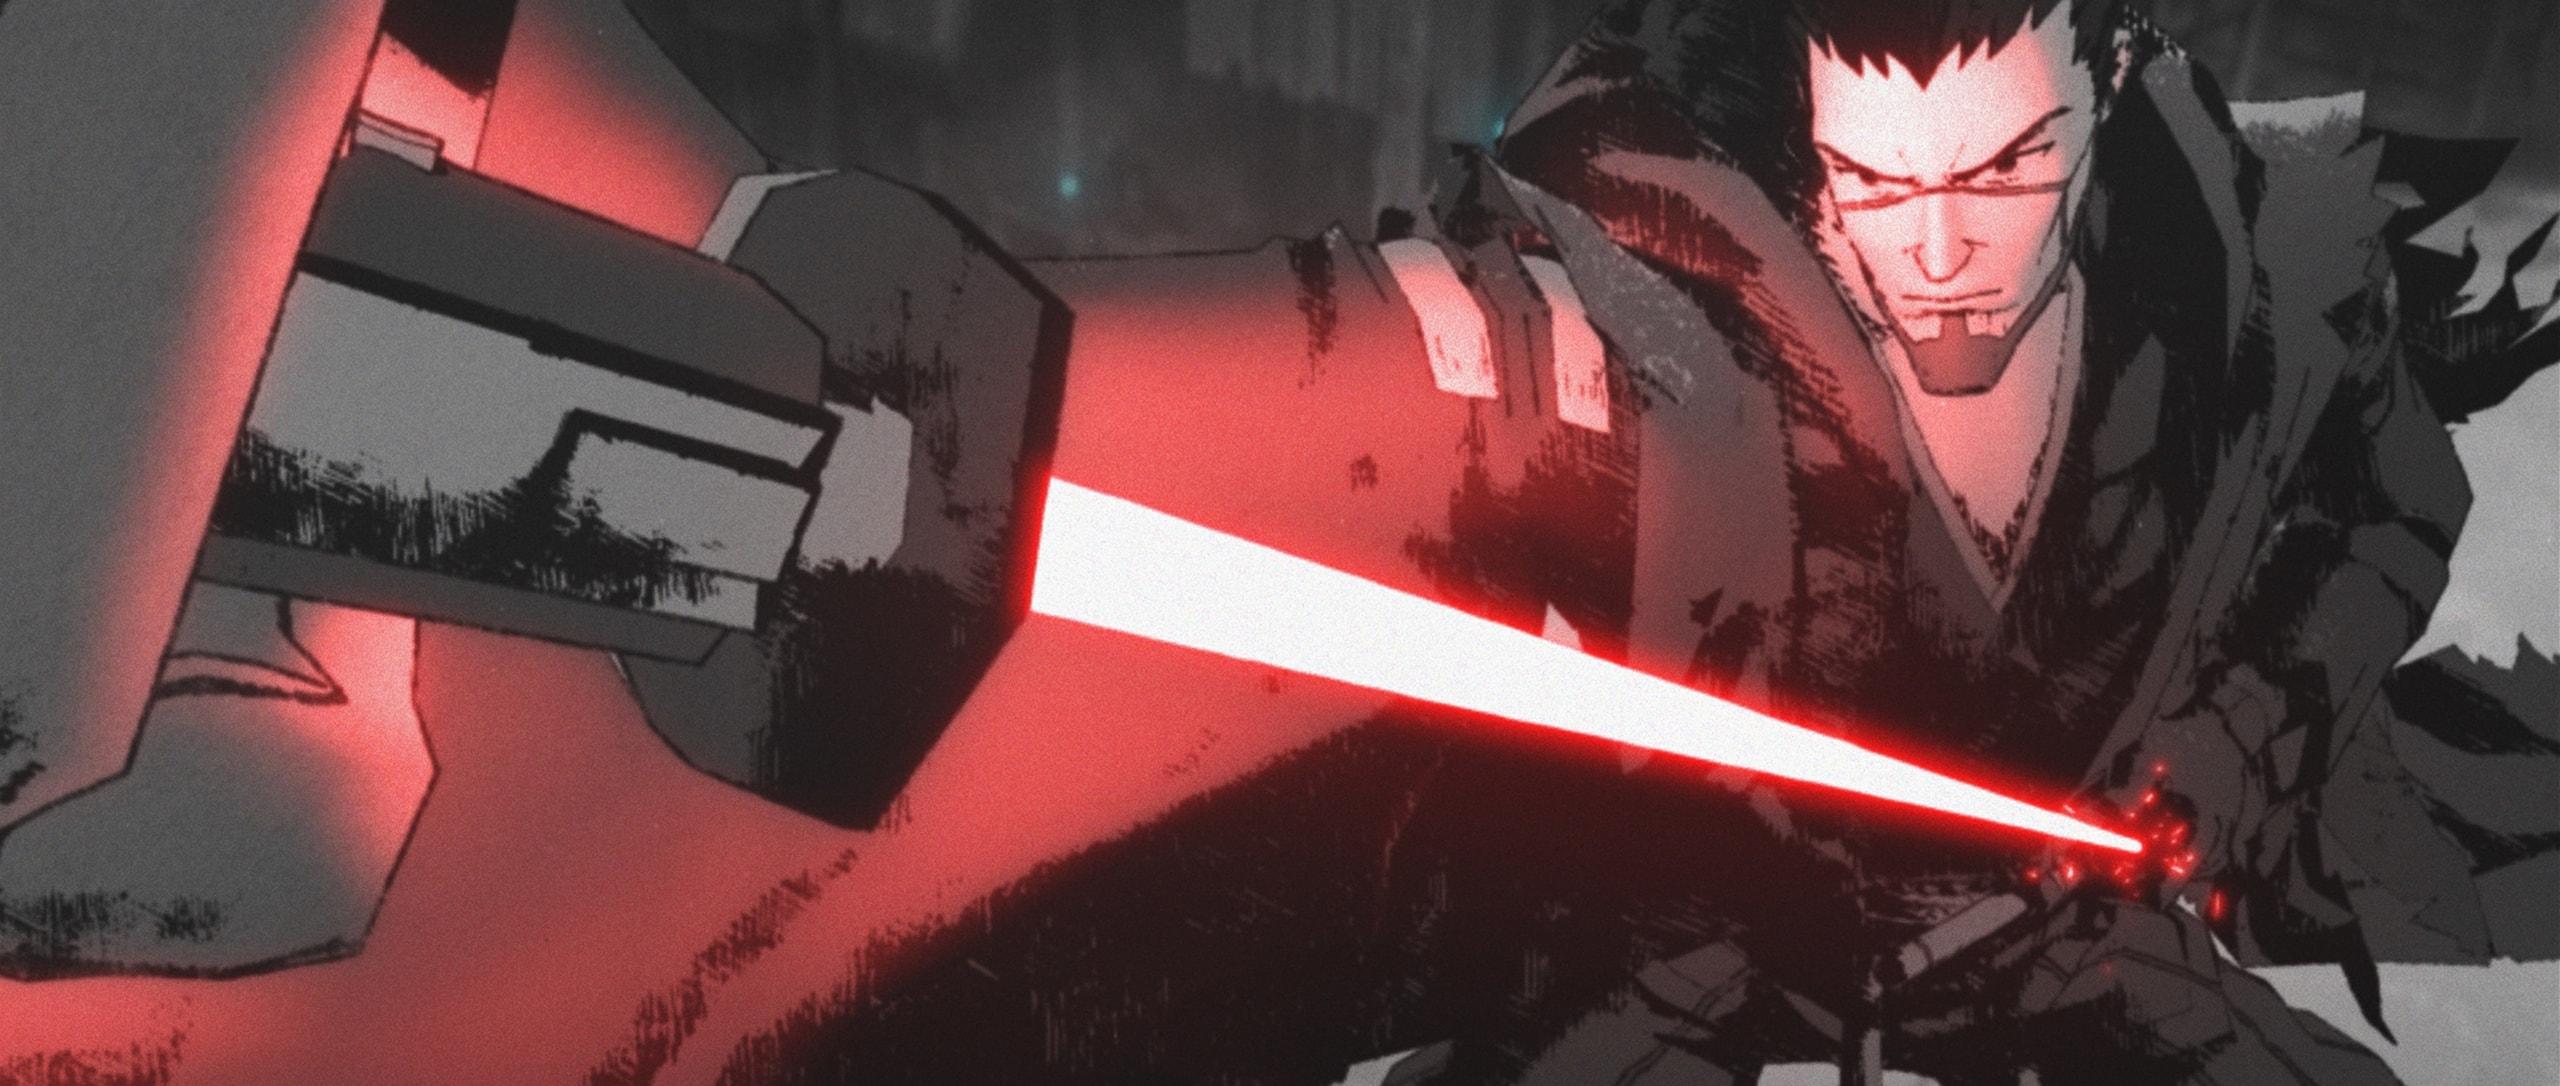 Star Wars Visions Review